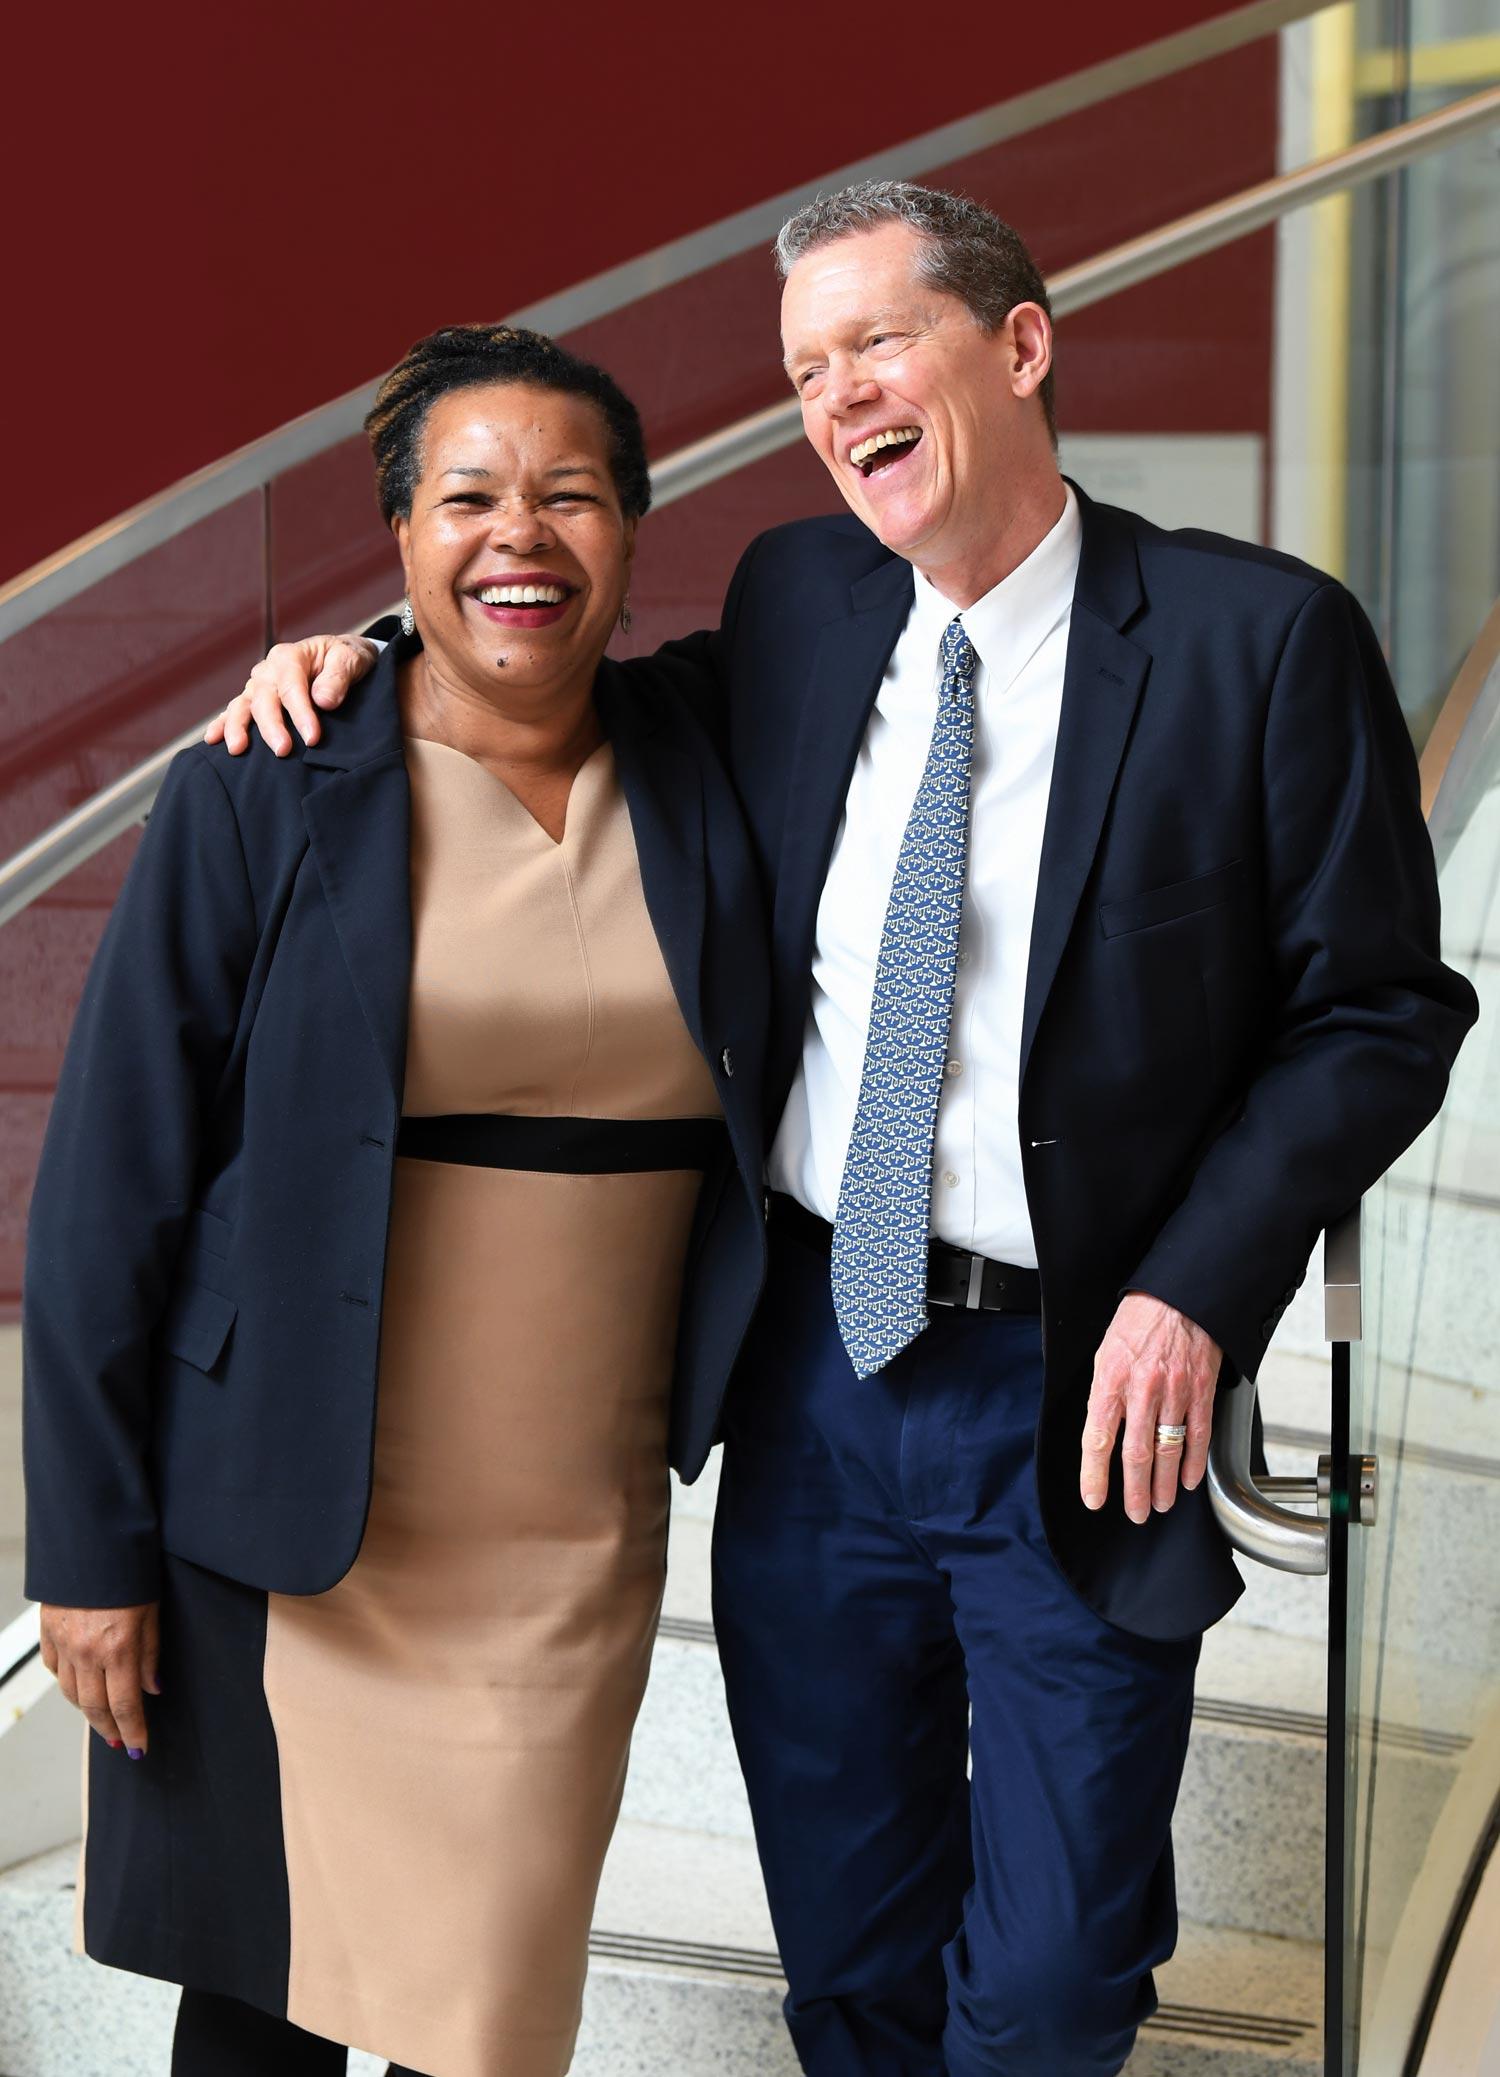 Nitza Escalera and Tom Schoenherr laughing together